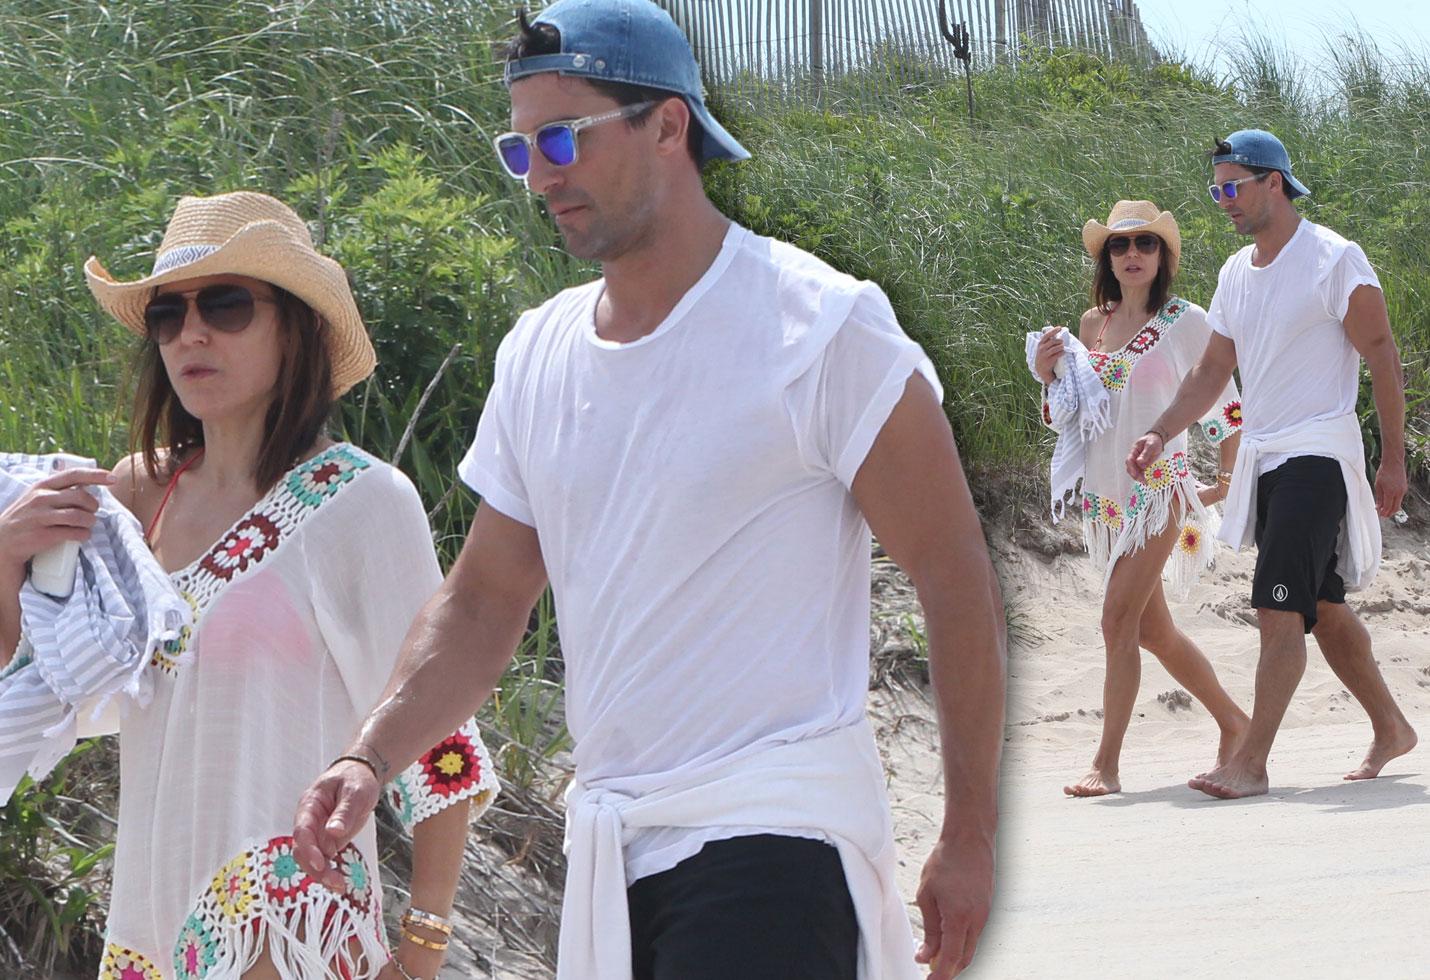 Bethenny Frankel New Boyfriend Beach Pics